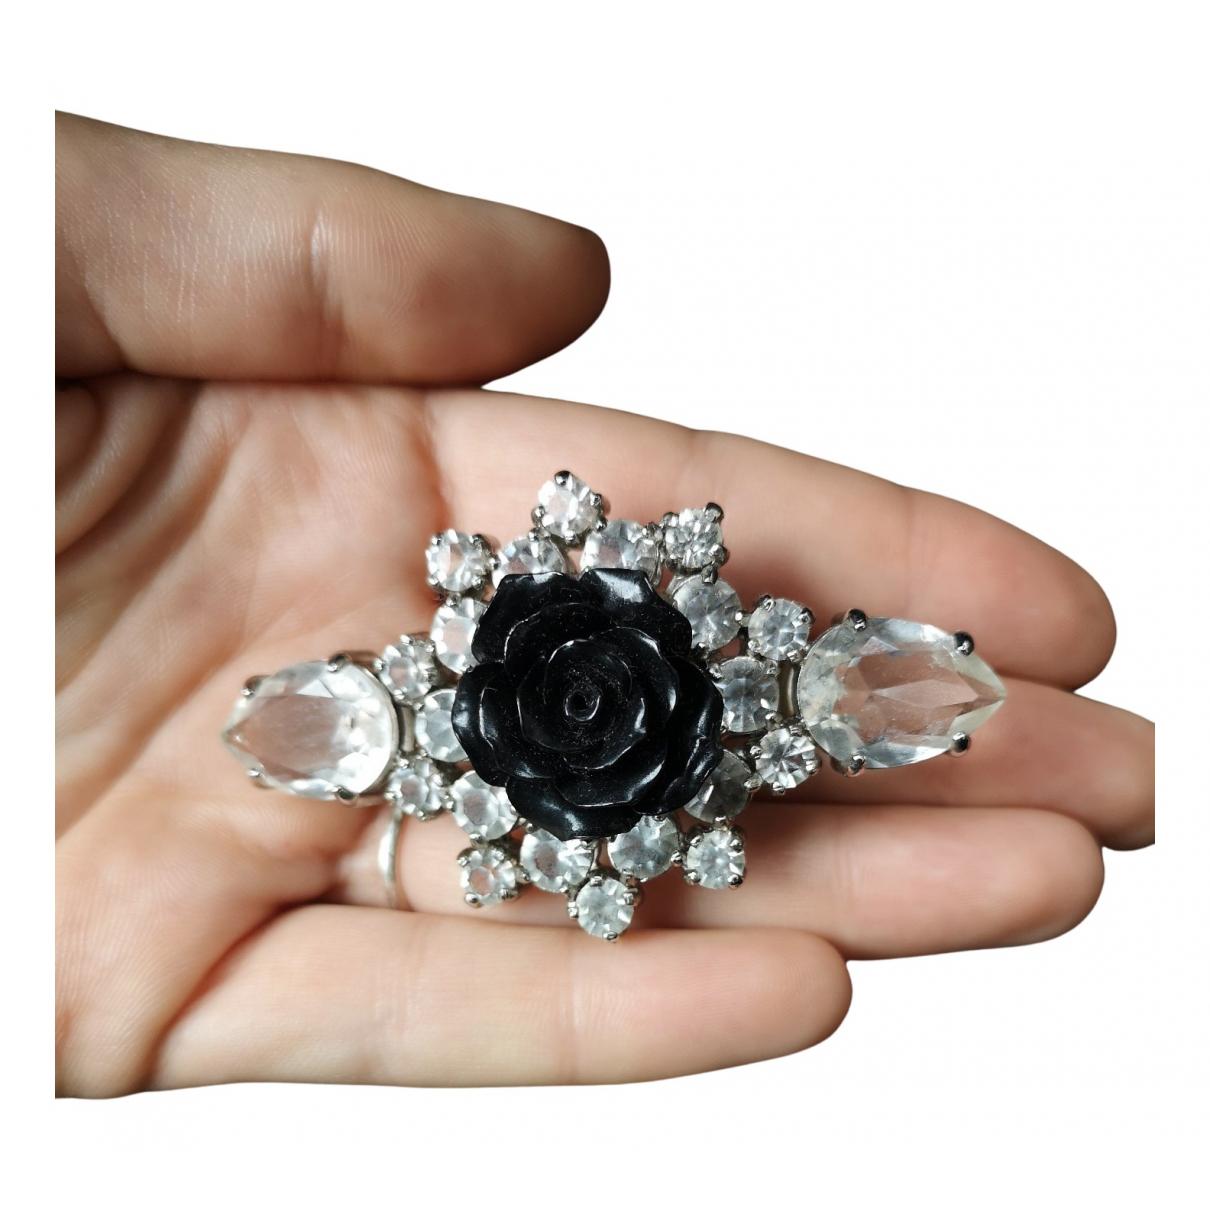 Prada \N Haarschmuck in  Schwarz Kristall